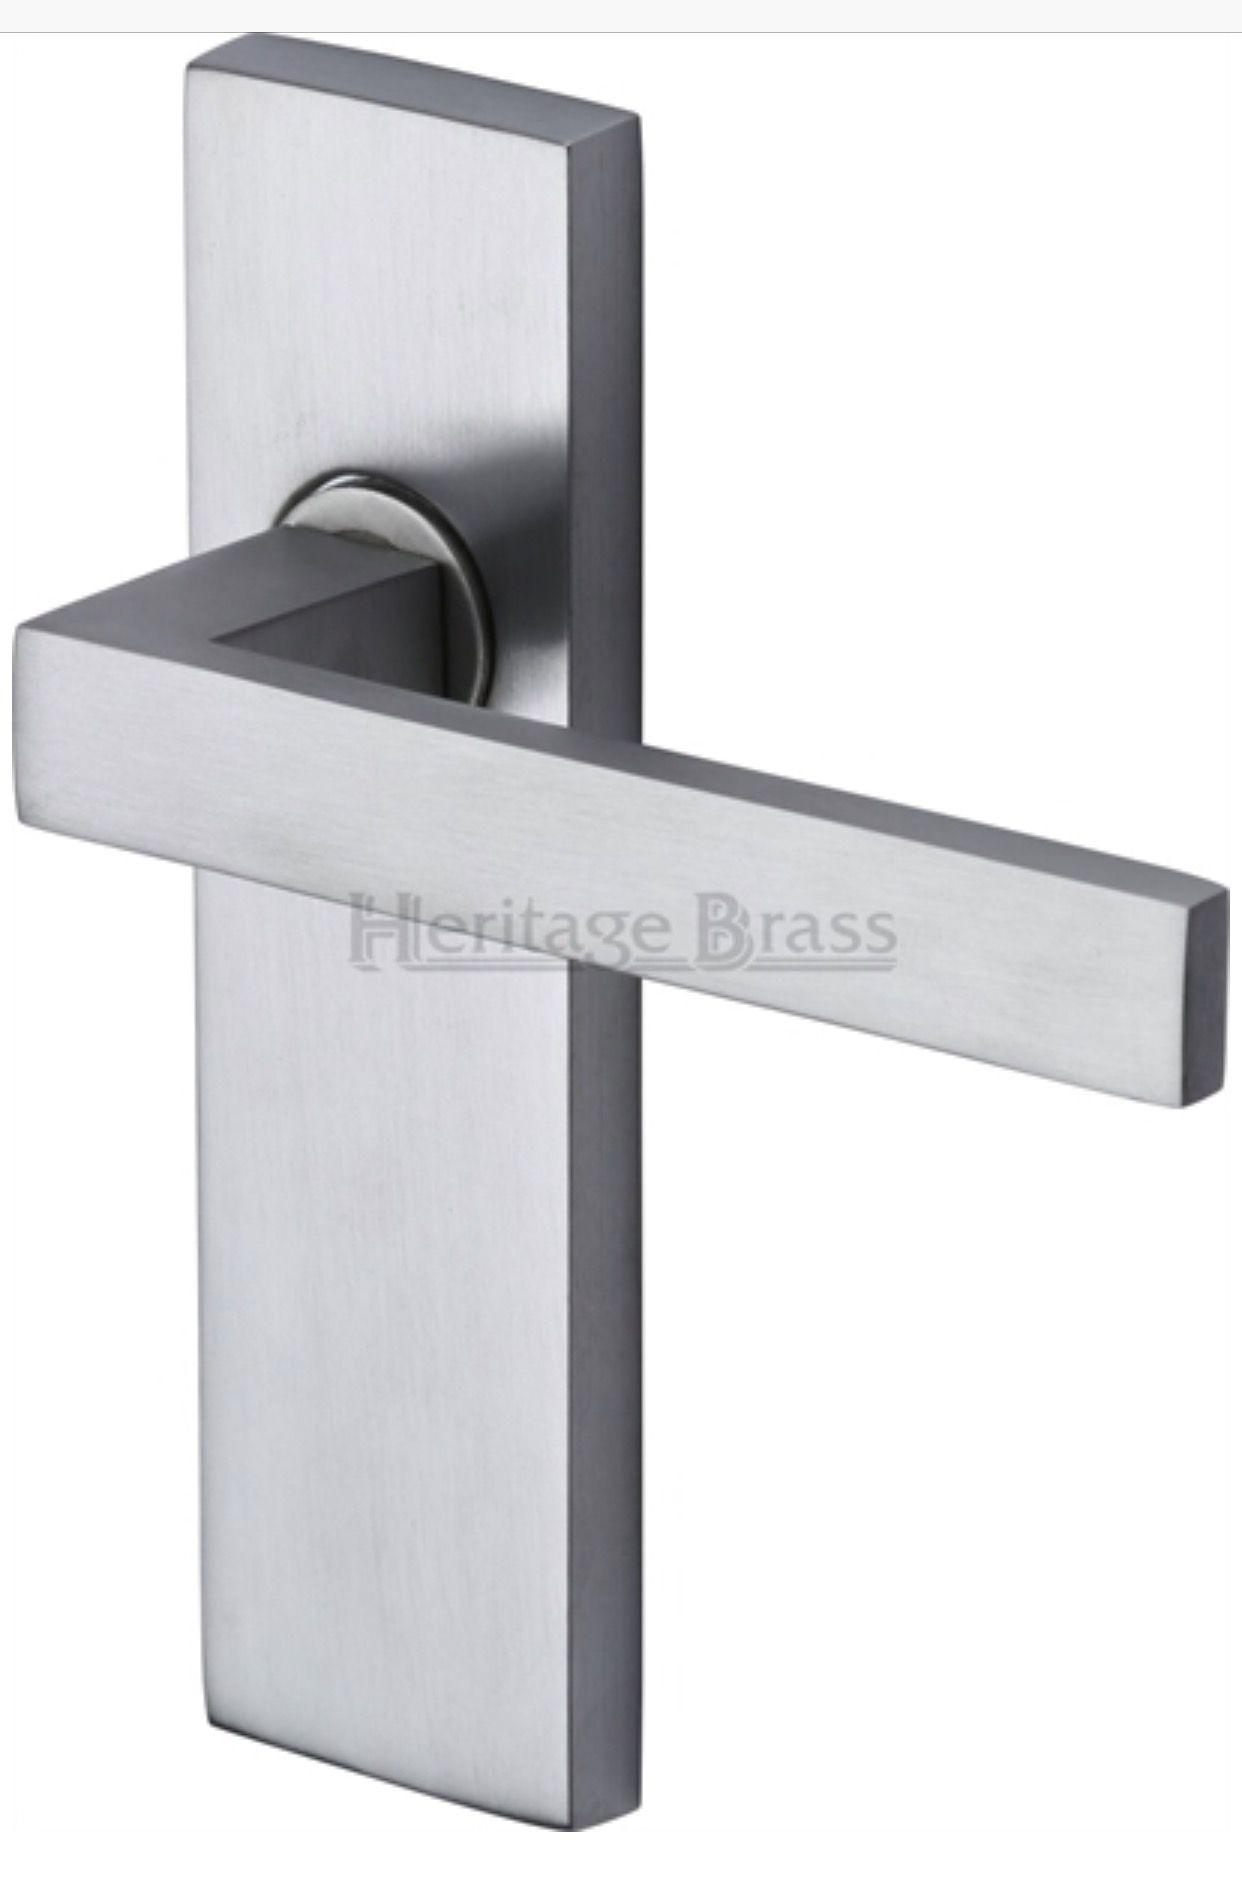 Pin On Door Handles On Backplate